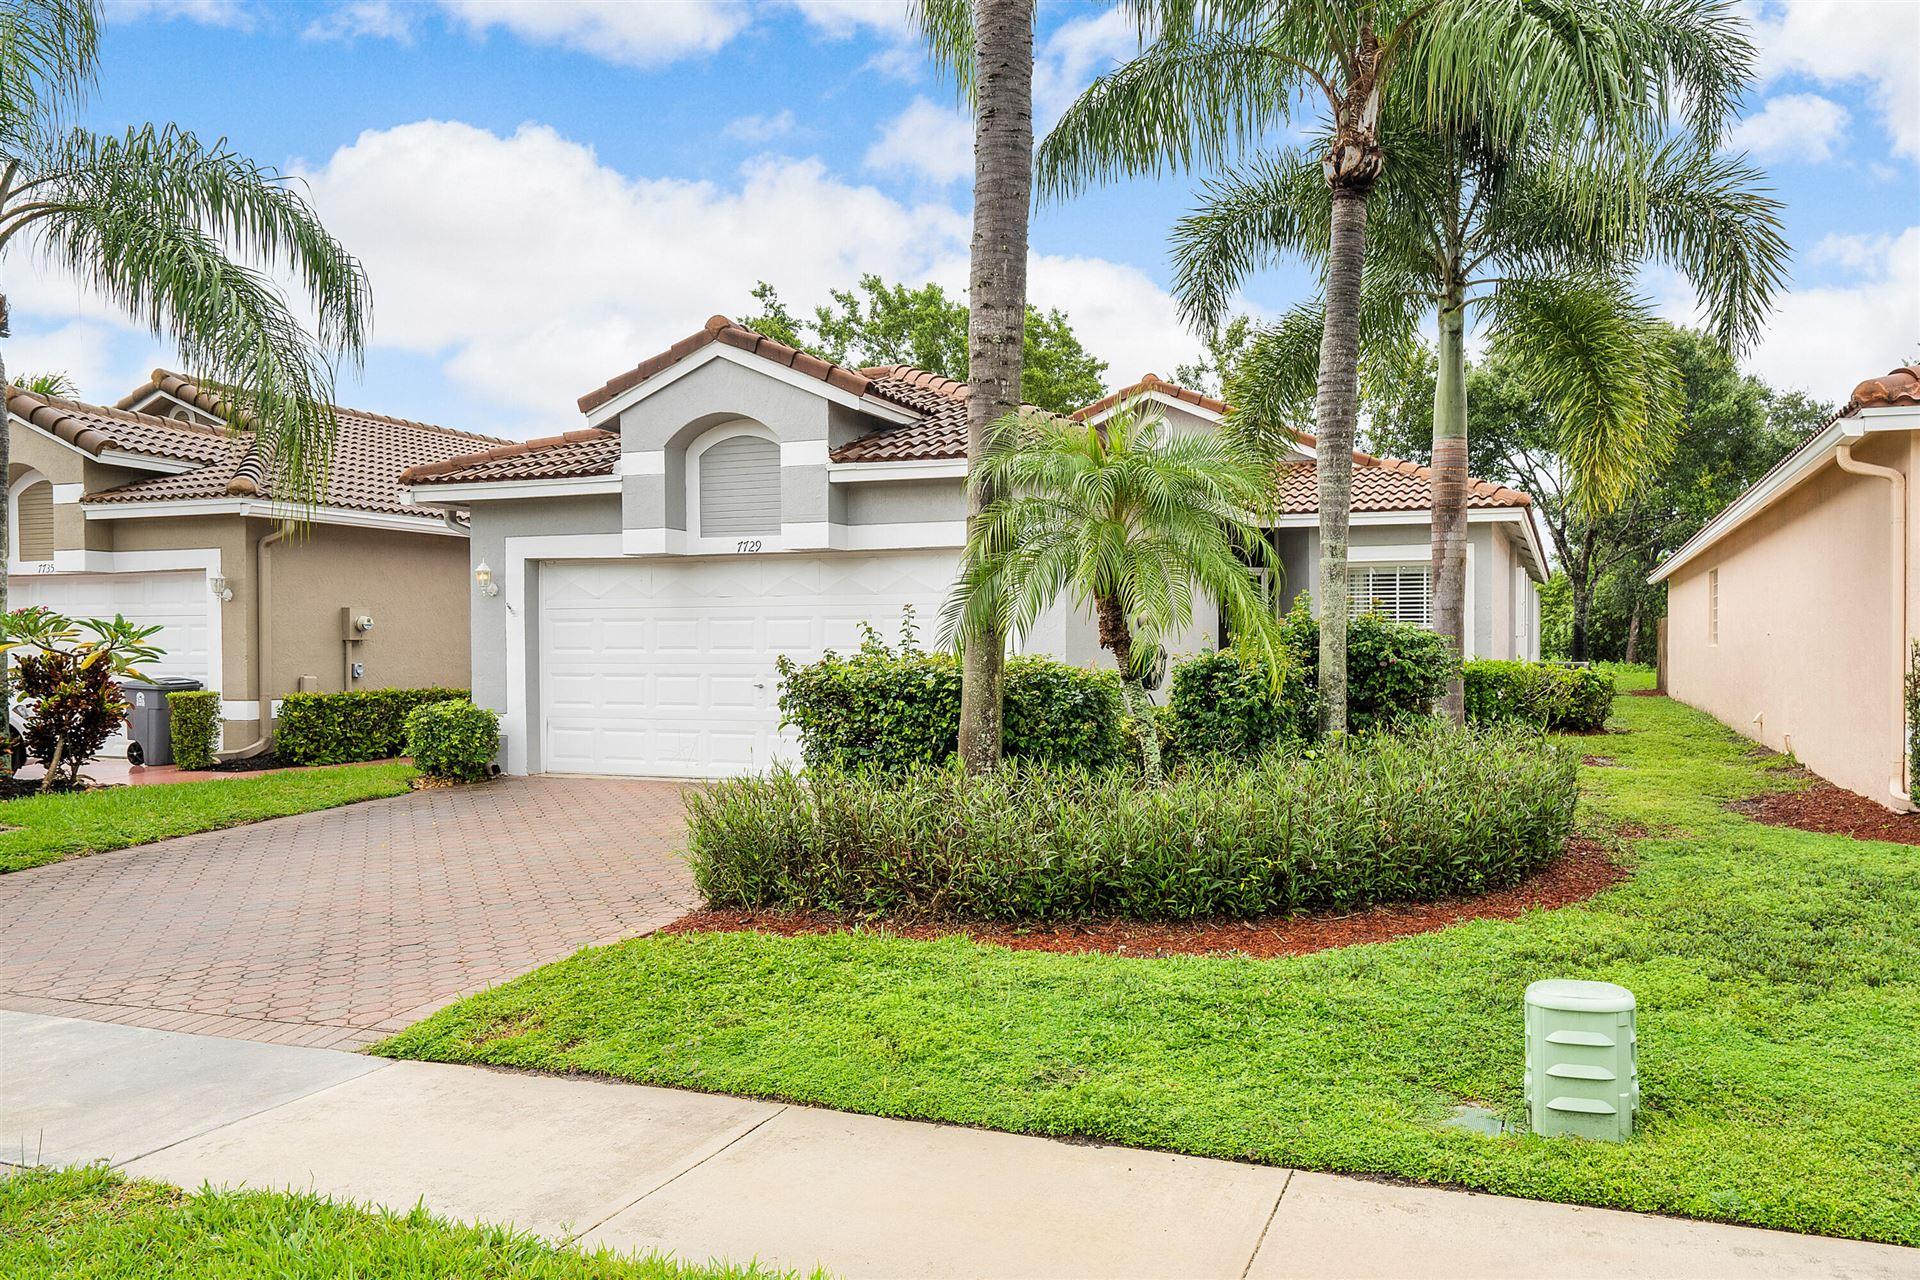 Photo of 7729 Cherry Blossom Street, Boynton Beach, FL 33437 (MLS # RX-10747347)